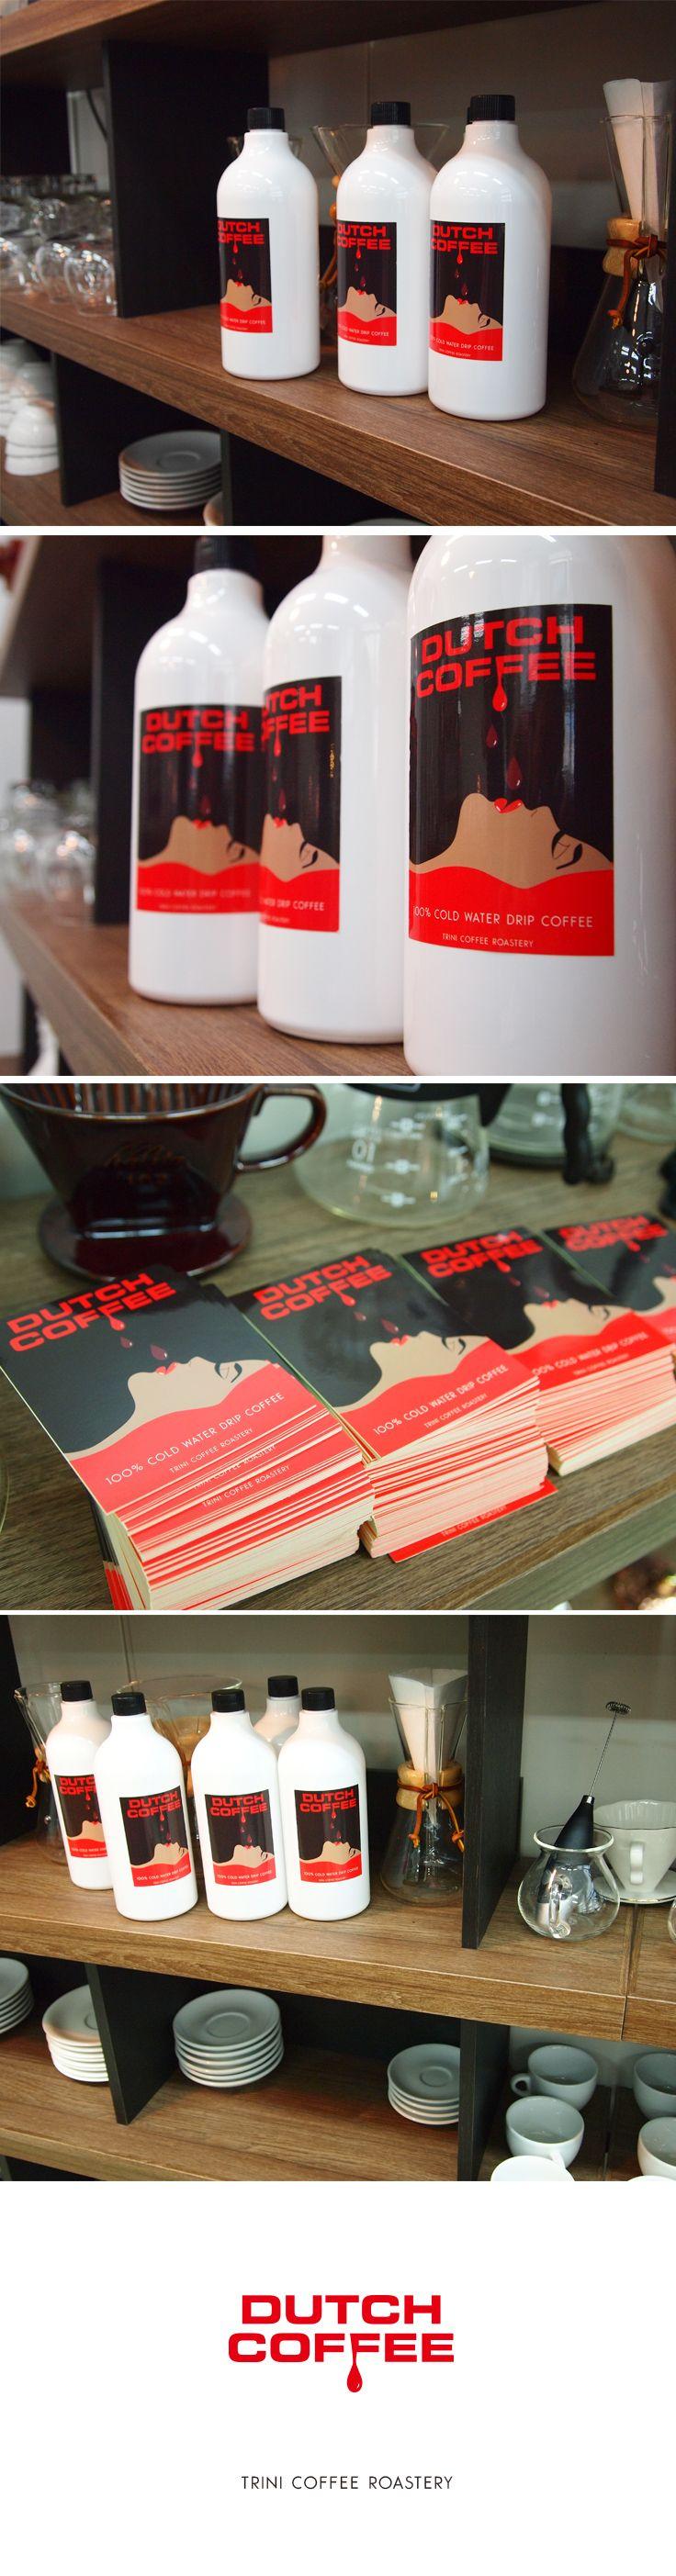 Label_Dutch coffee/ Client_TRINI COFFEE / vayu